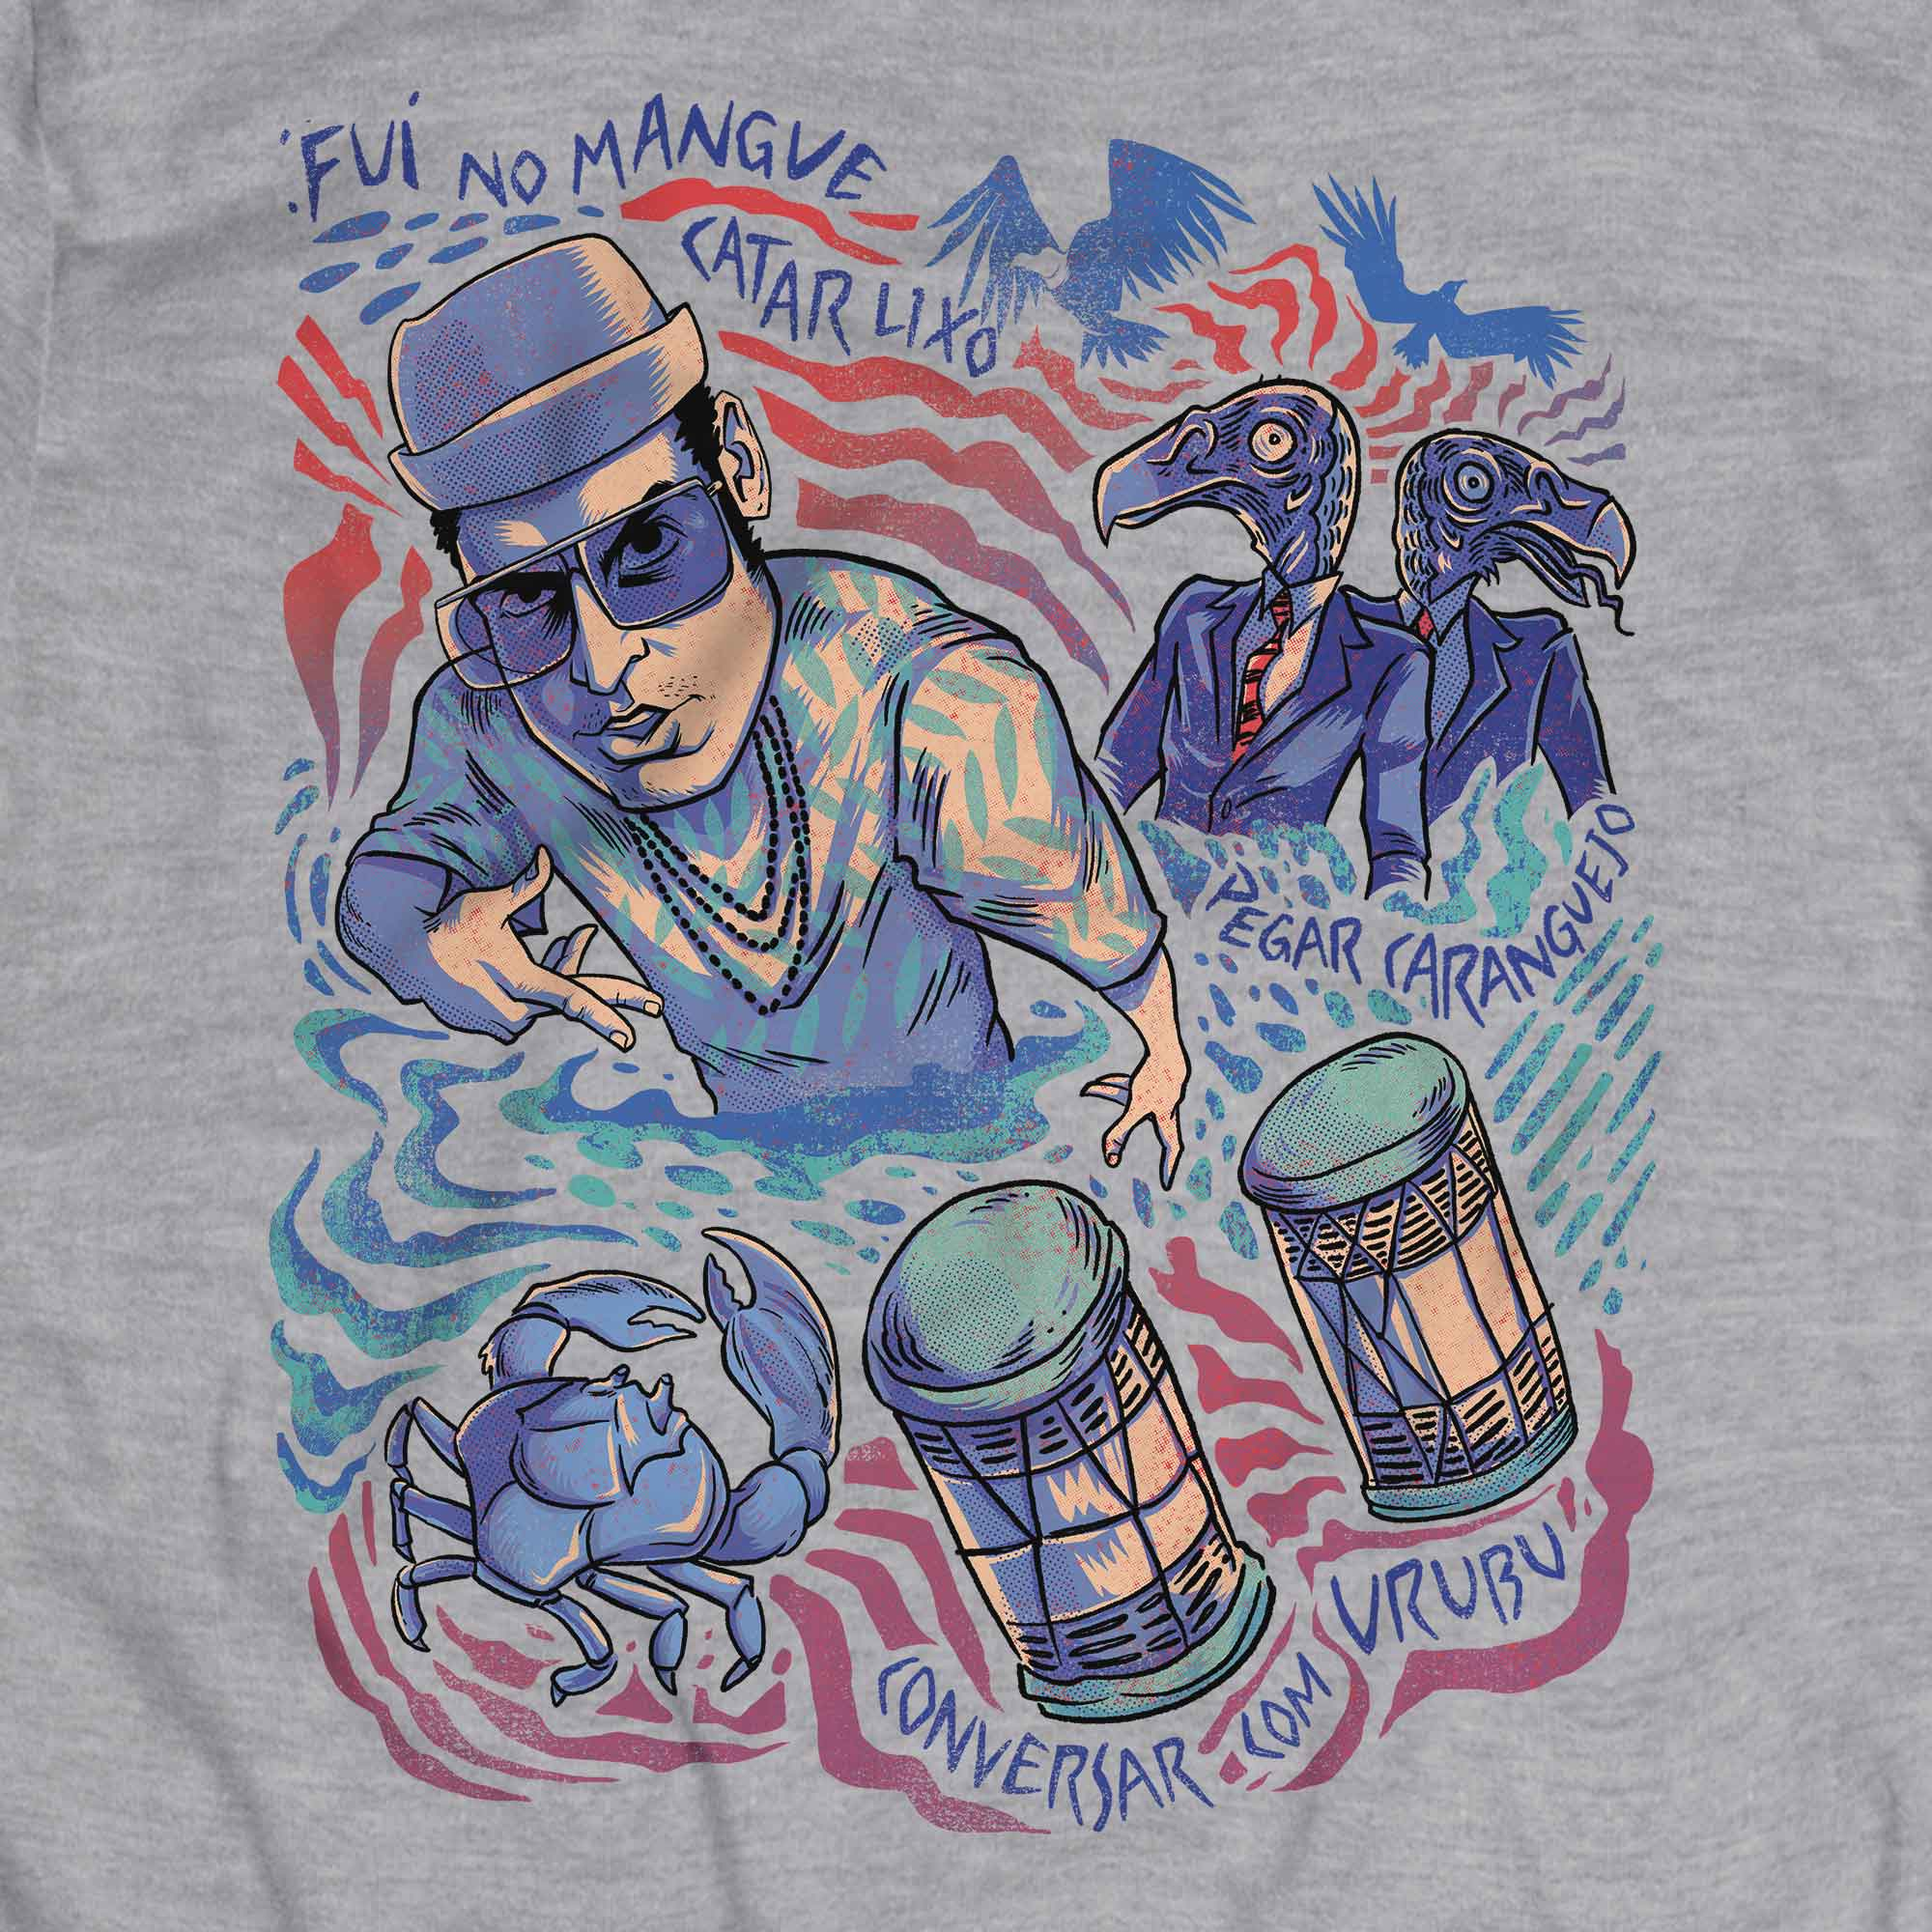 Camiseta Manguetown - Chico Science Nação Zumbi - Masculino